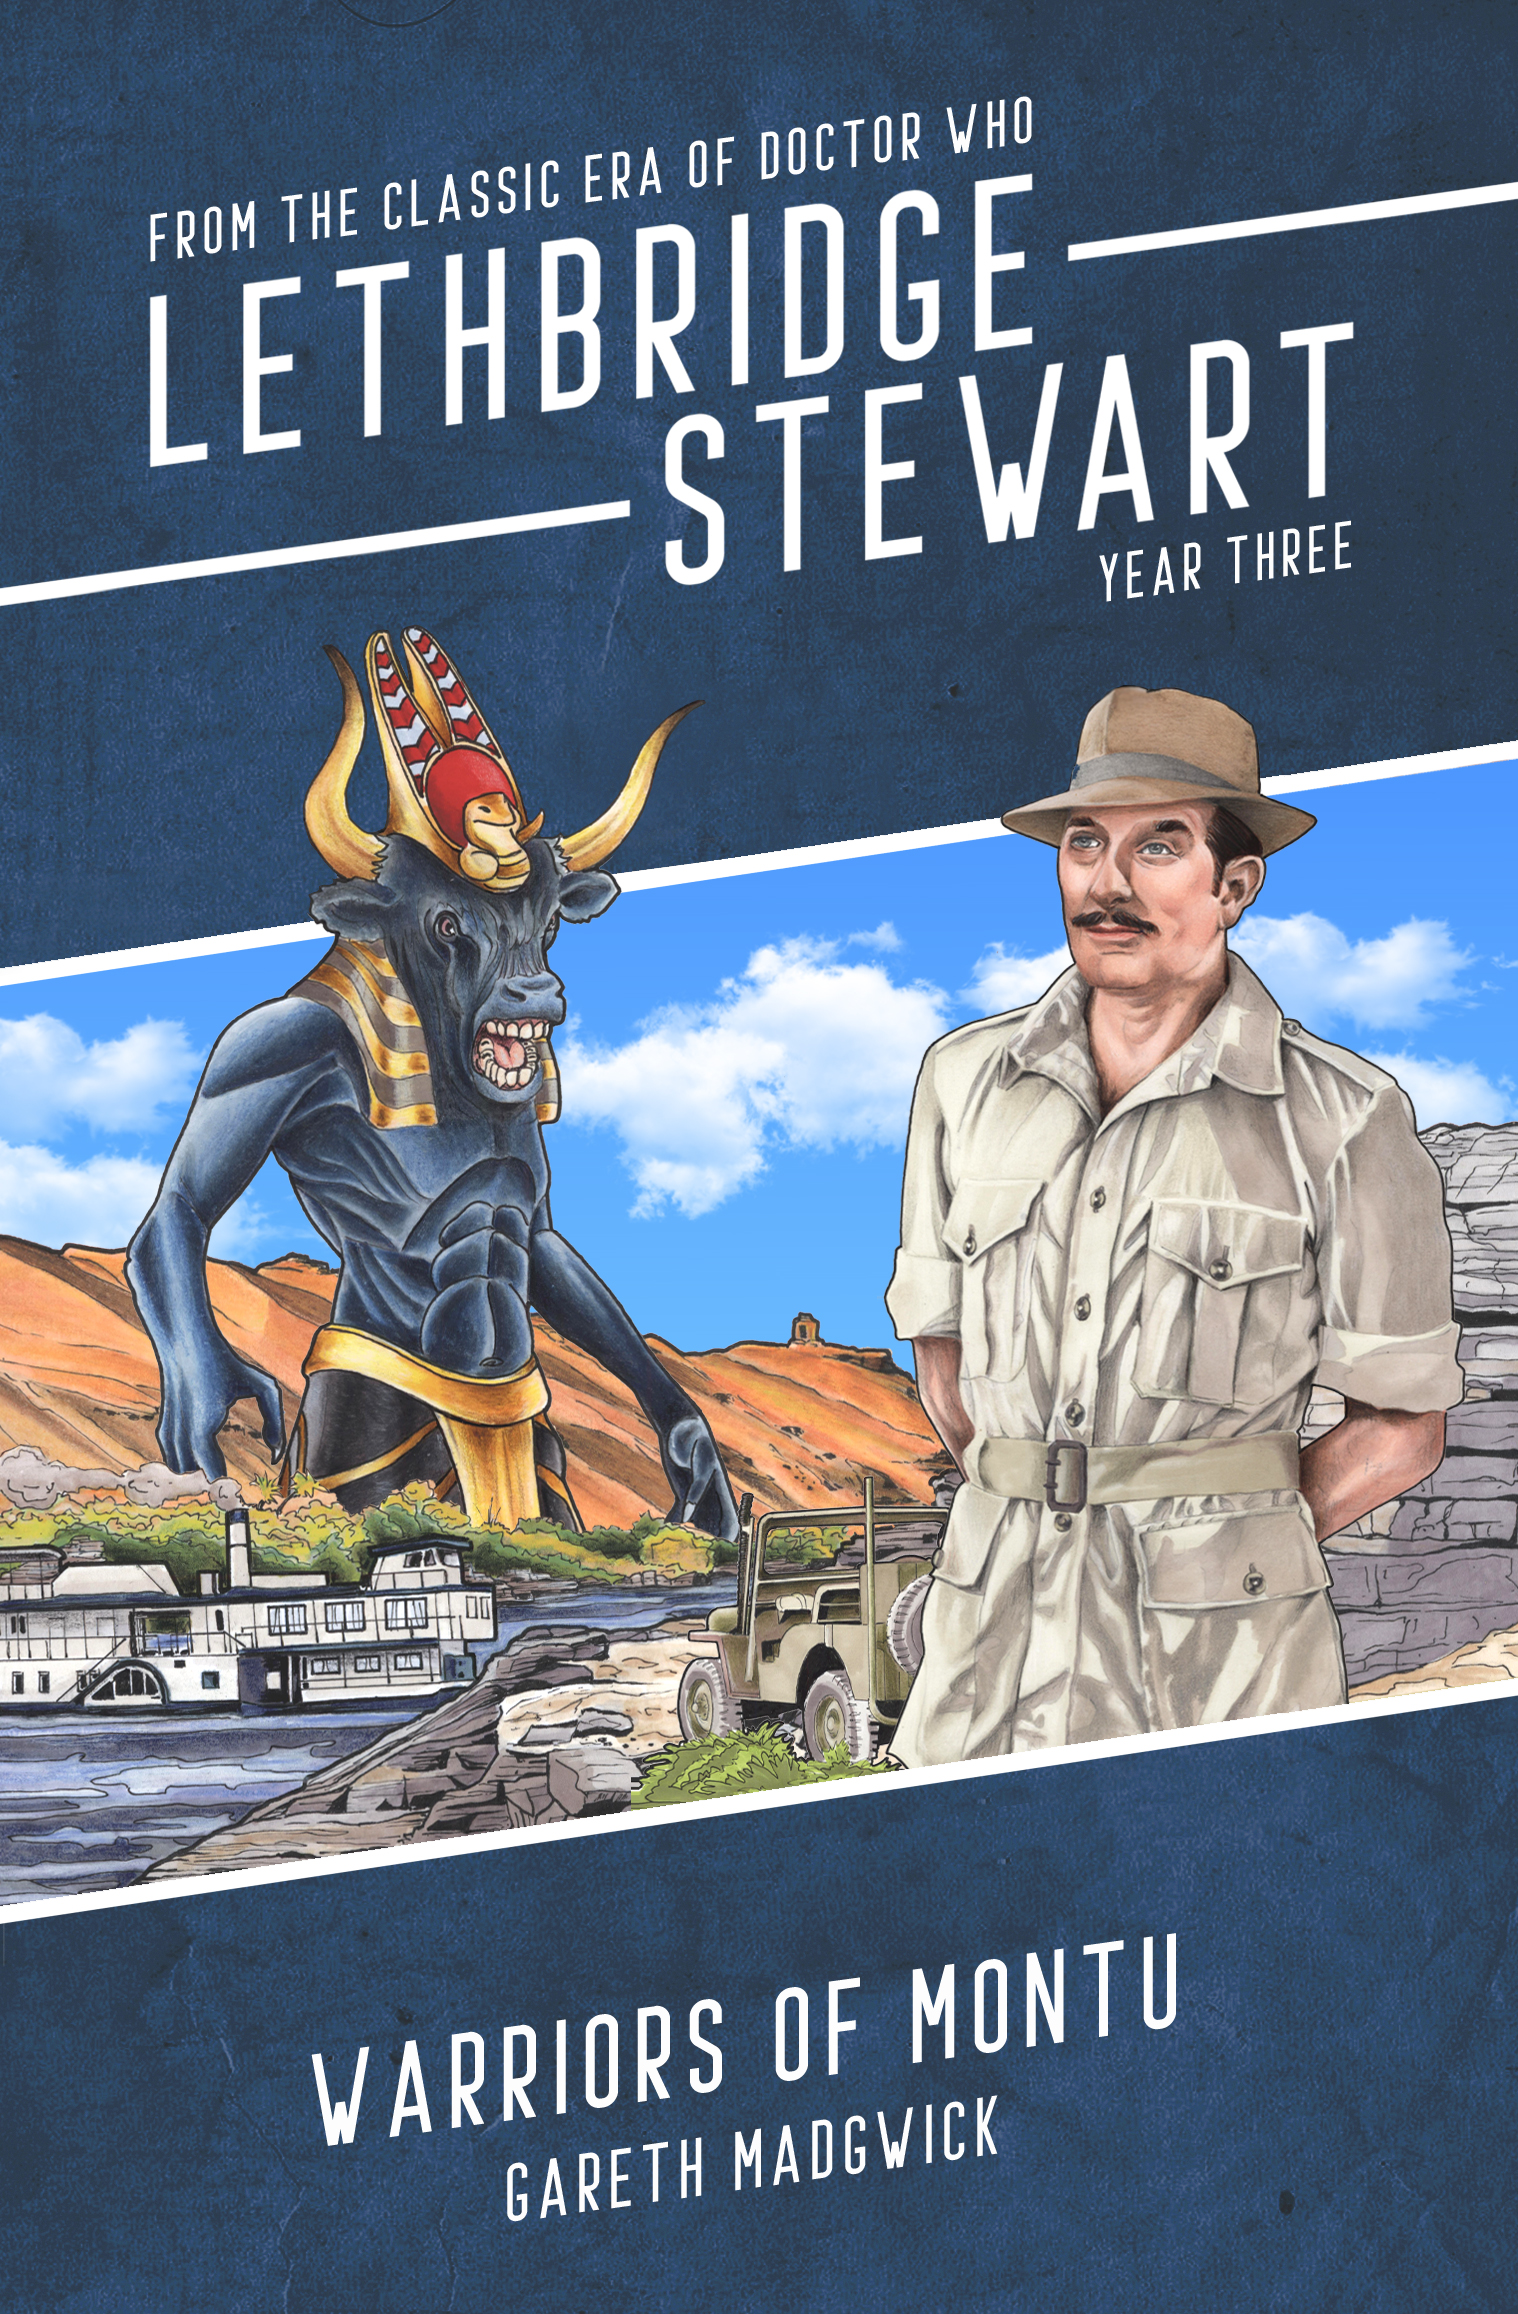 Warriors of Montu Launches Candy Jar Books' Lethbridge-Stewart Series 9